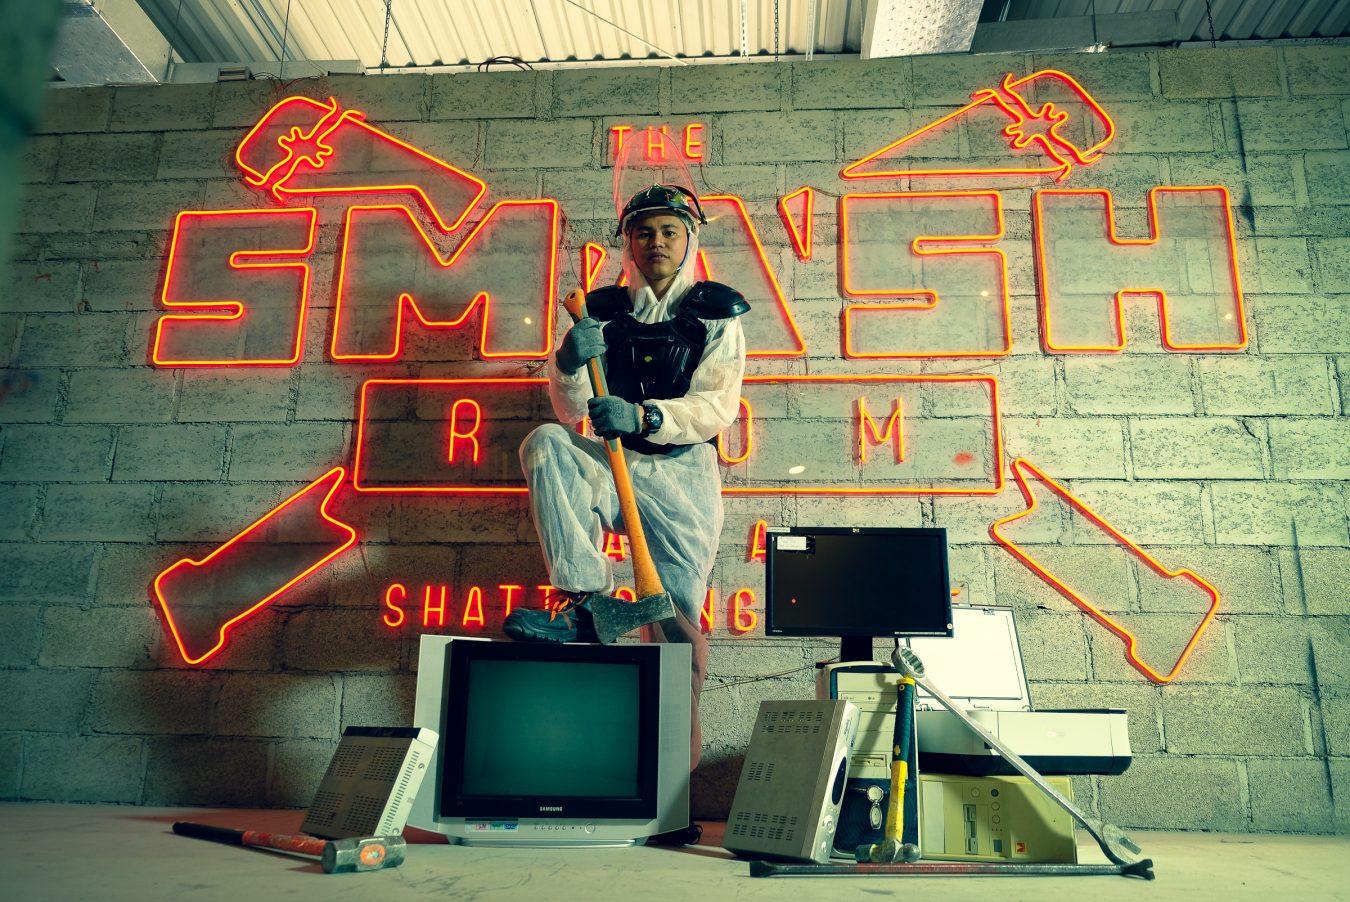 Man posing with axe at The Smash Room Dubai